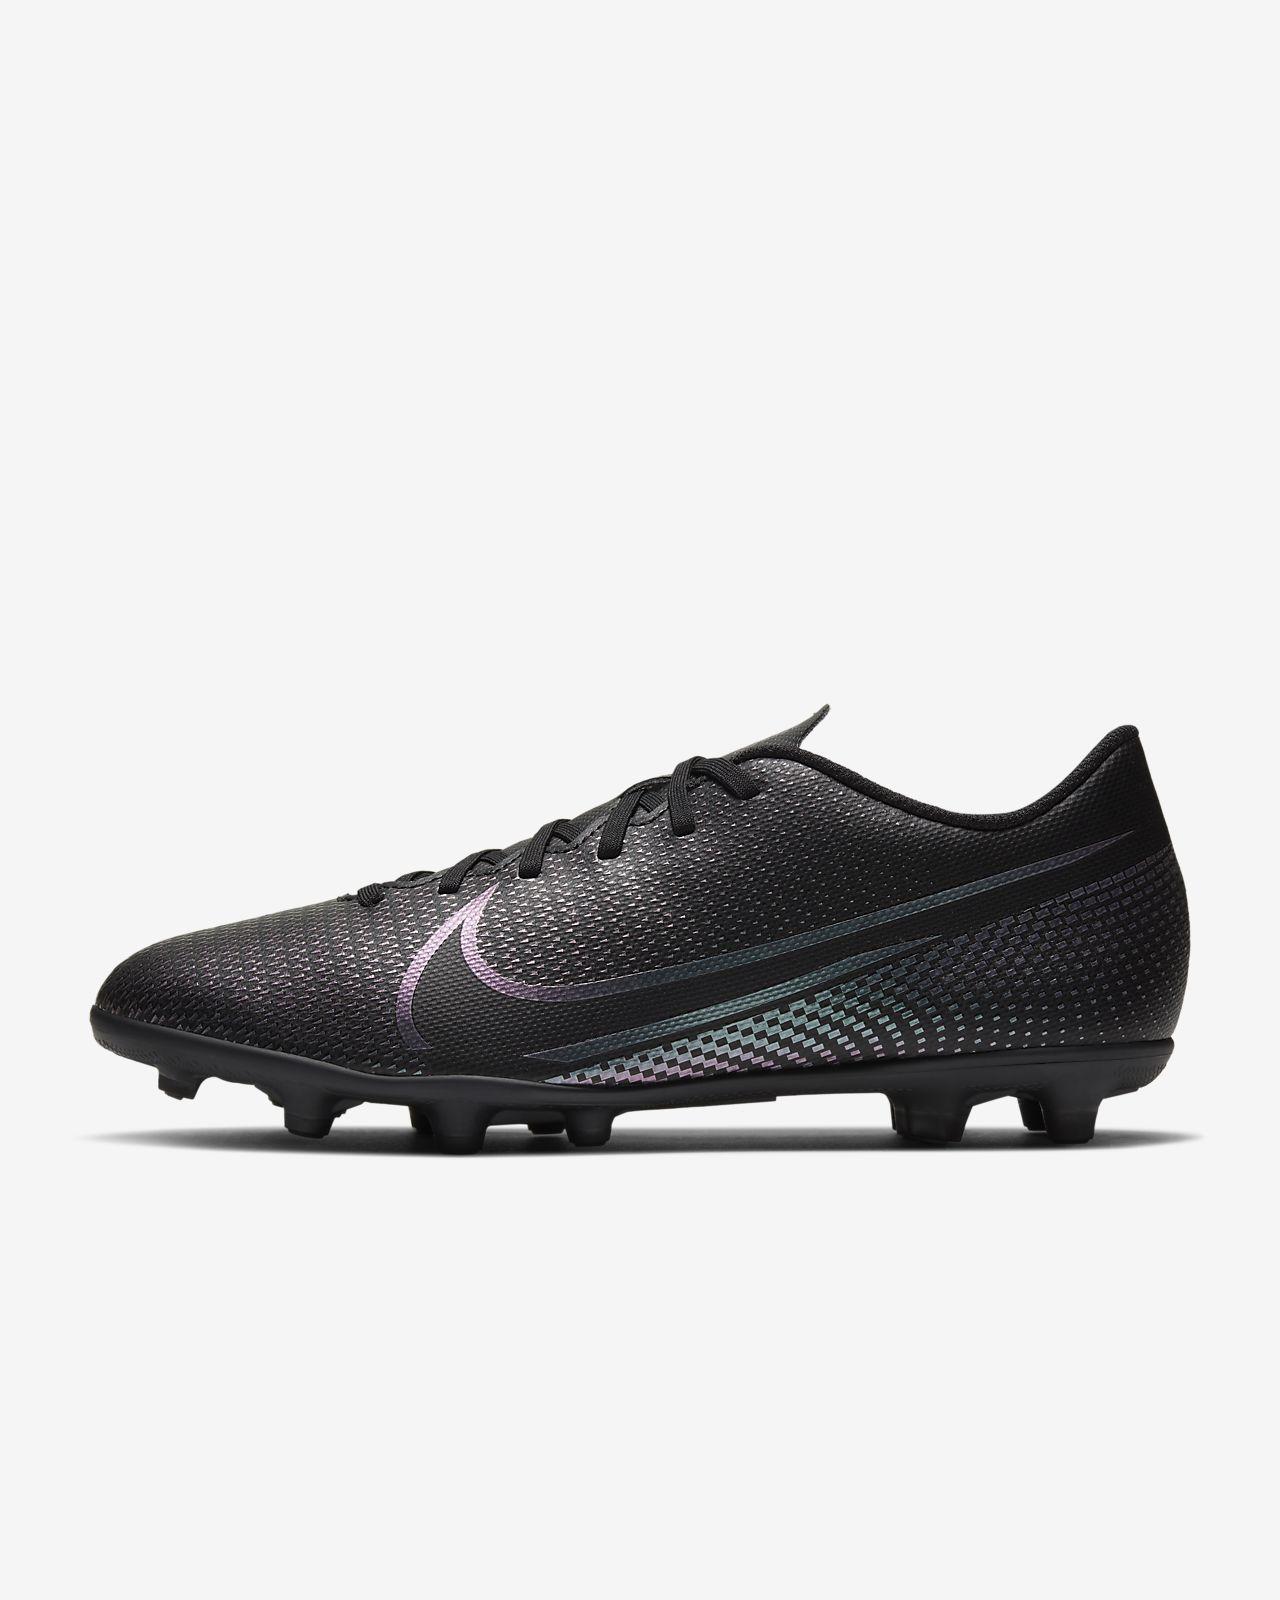 Calzado de fútbol para múltiples superficies Nike Mercurial Vapor 13 Club MG